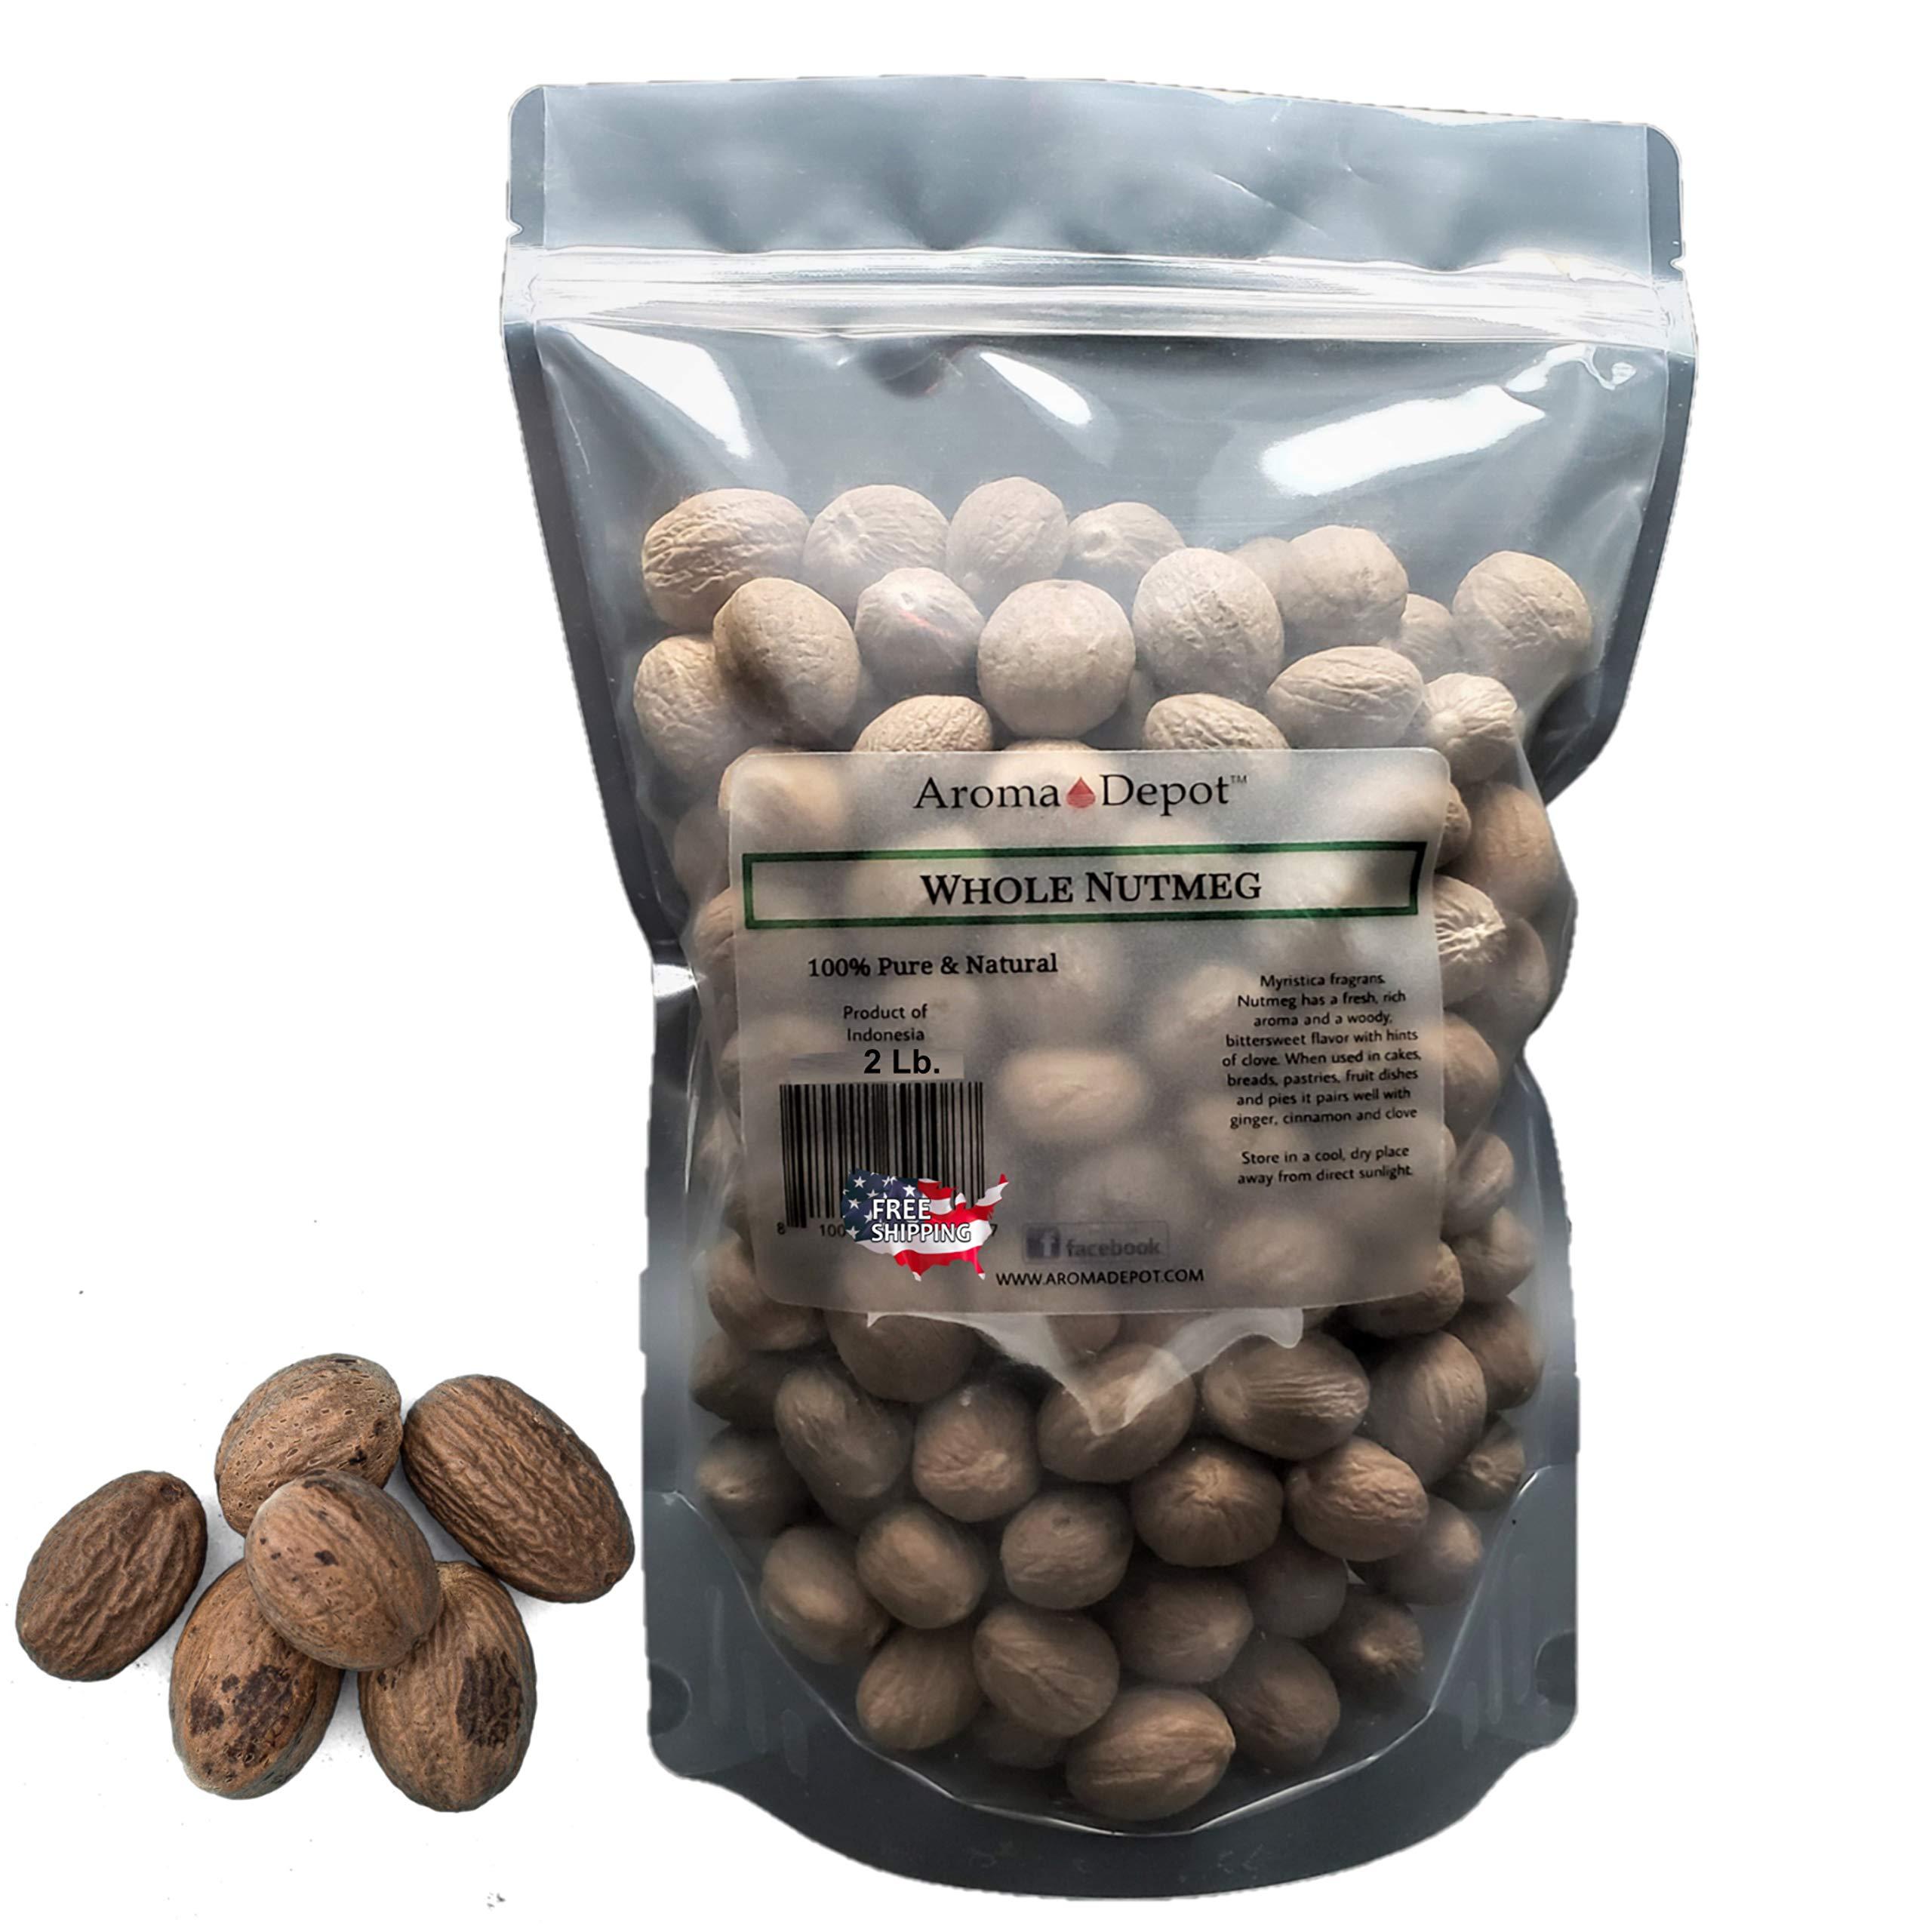 100% Natural Premium Whole Nutmeg Seasoning Spice Kosher Non-GMO Free (2 Lb)